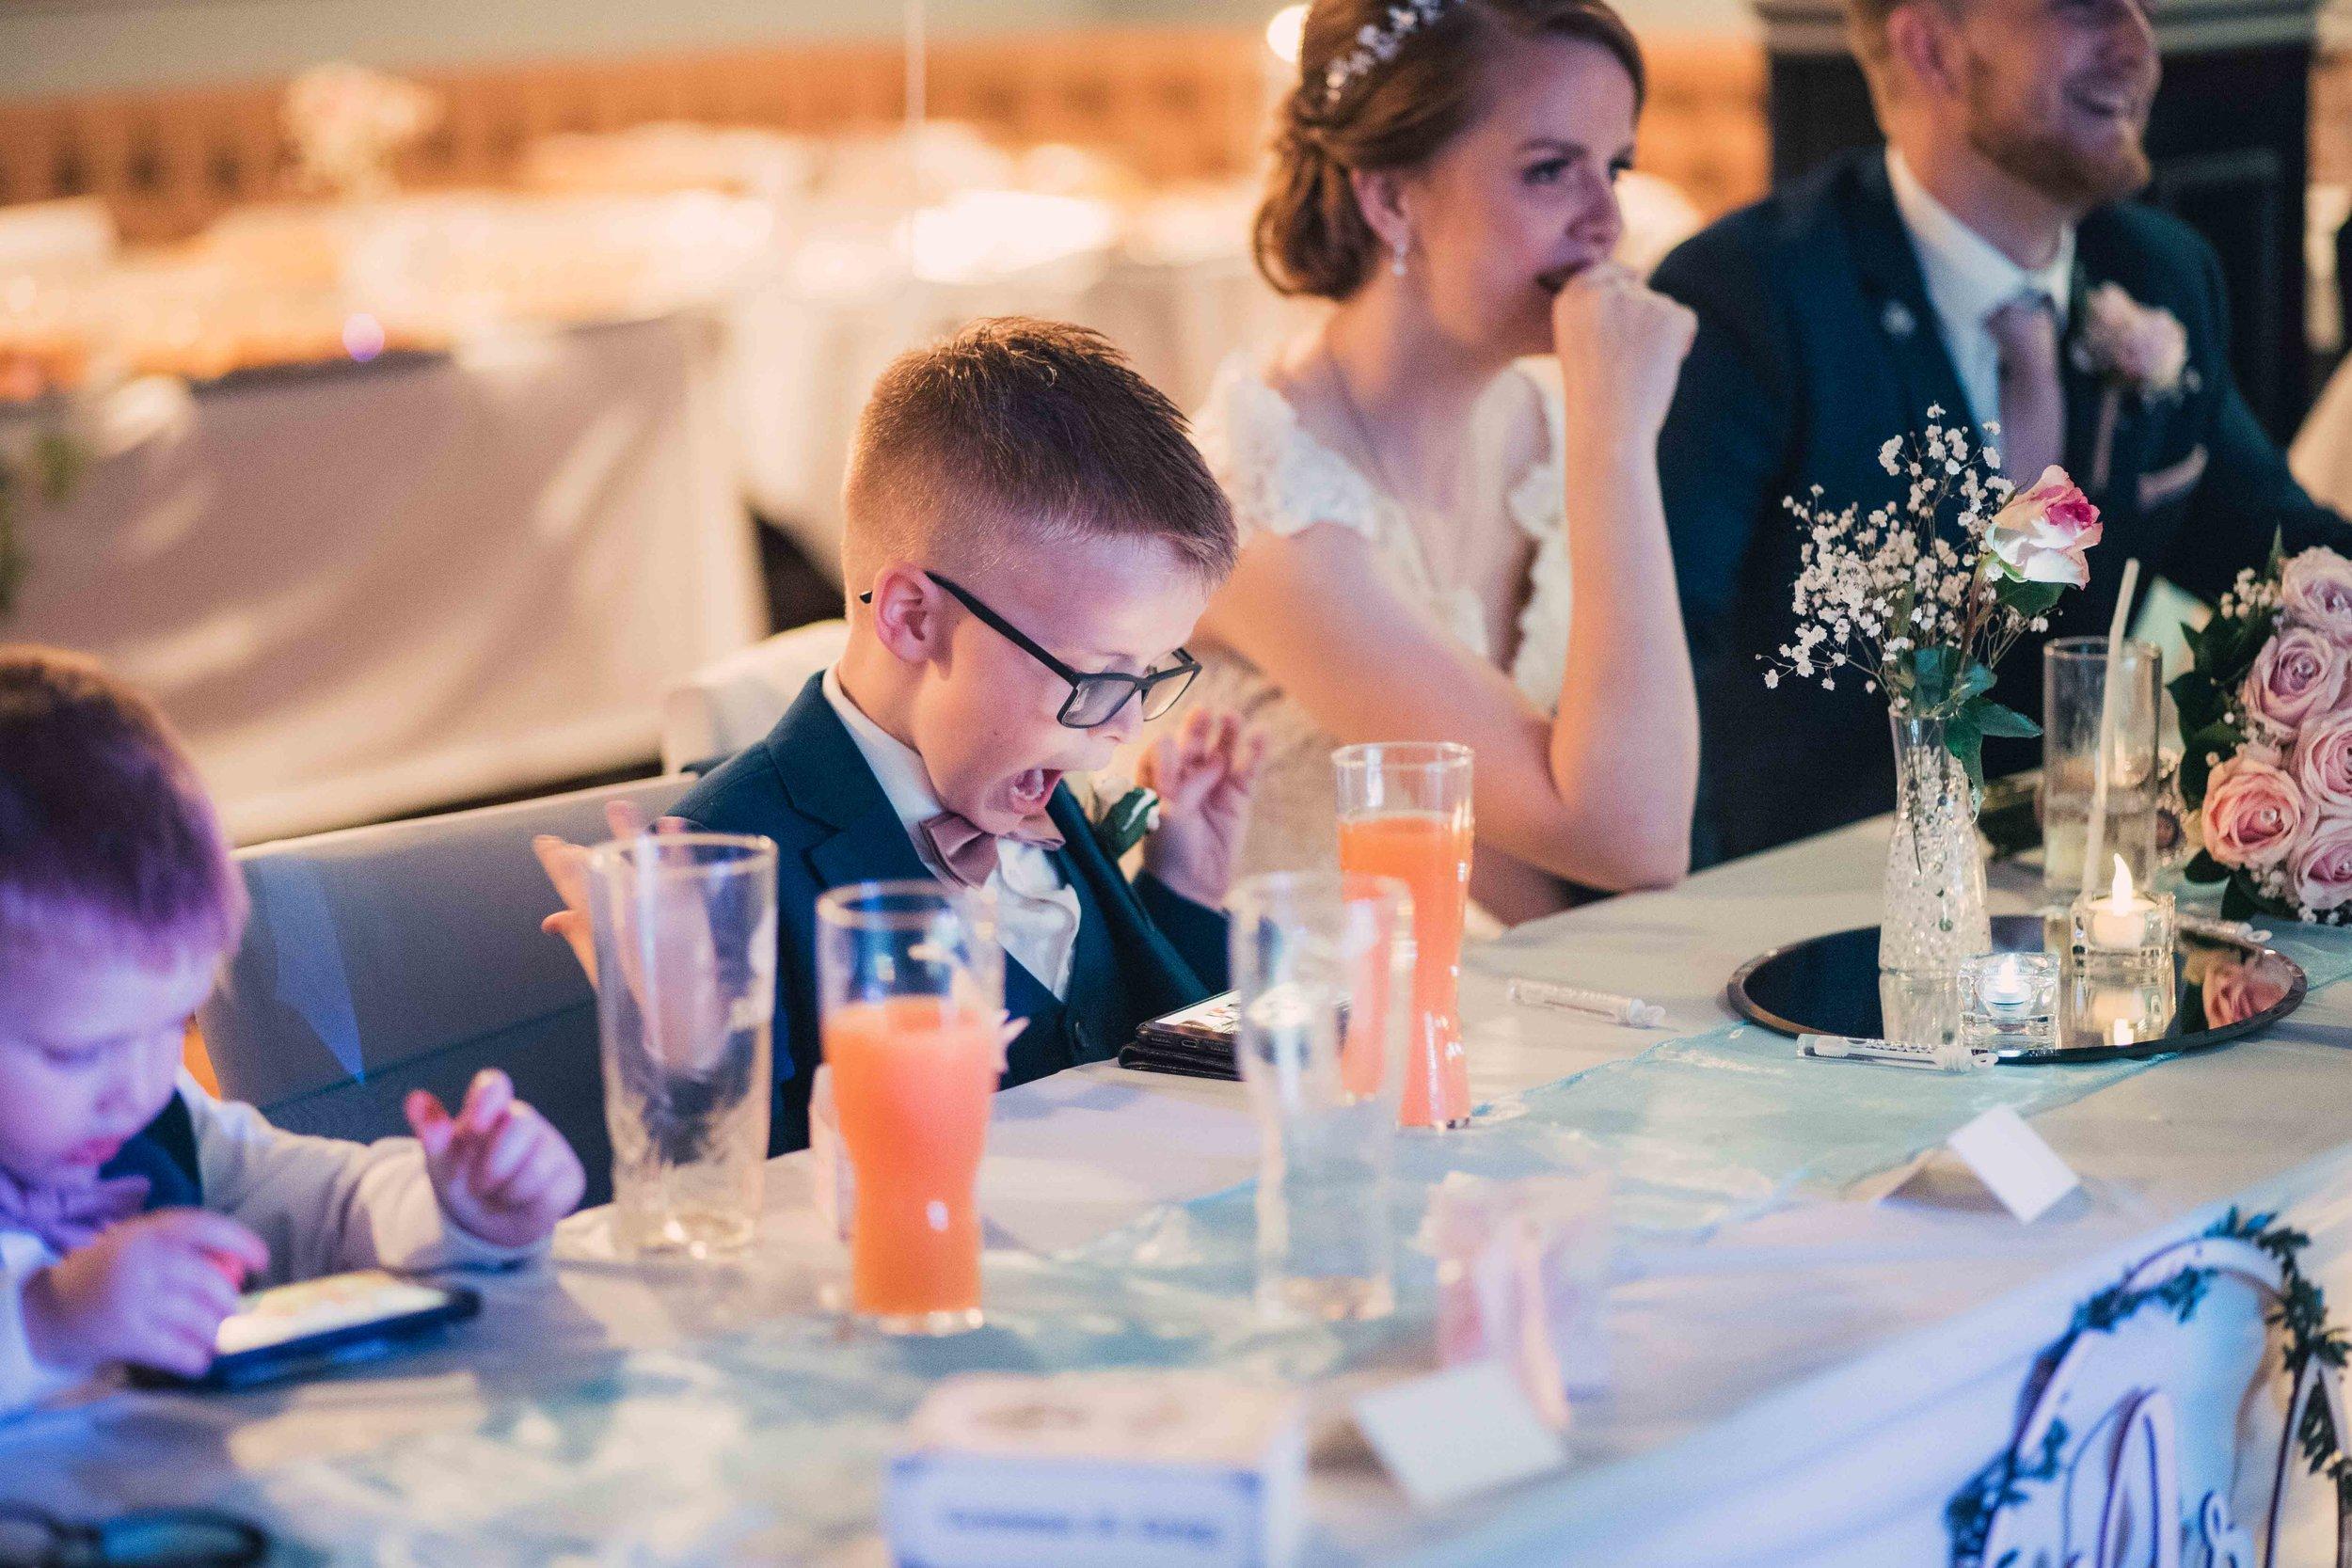 Lea-cooper-photography-willenhall-wolverhampton-wedding-photographer-birmingham-shirley-west-midlands-ceremony-church-27.JPG